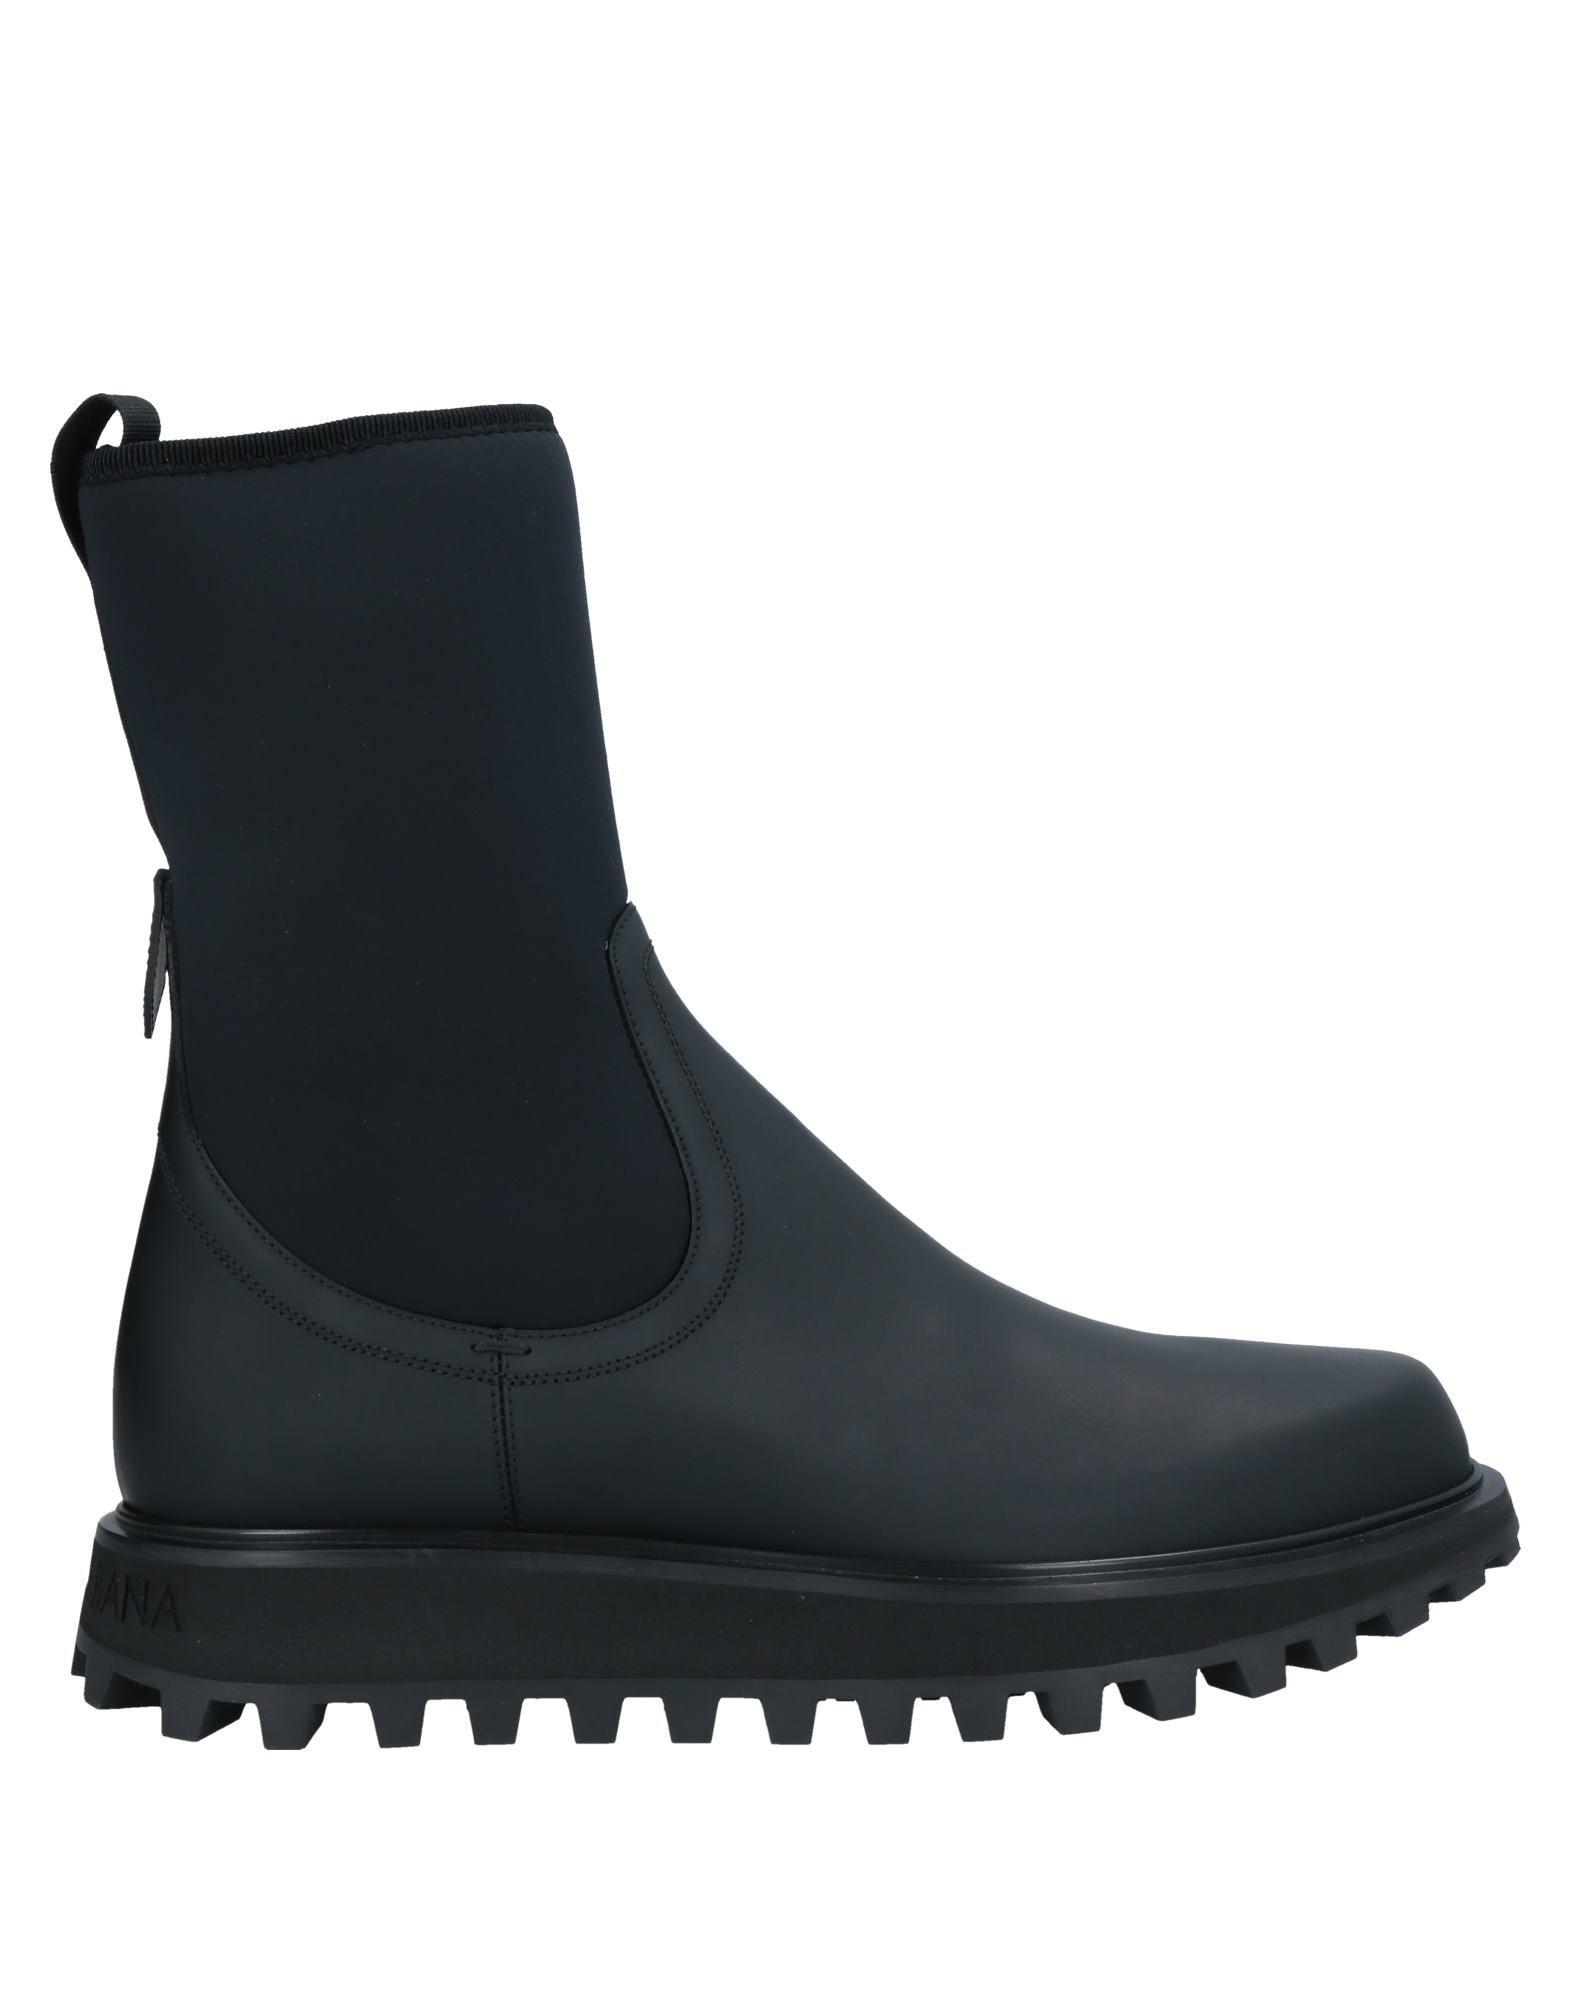 DOLCE & GABBANA ドルチェ & ガッバーナ メンズ ブーツ ブラック